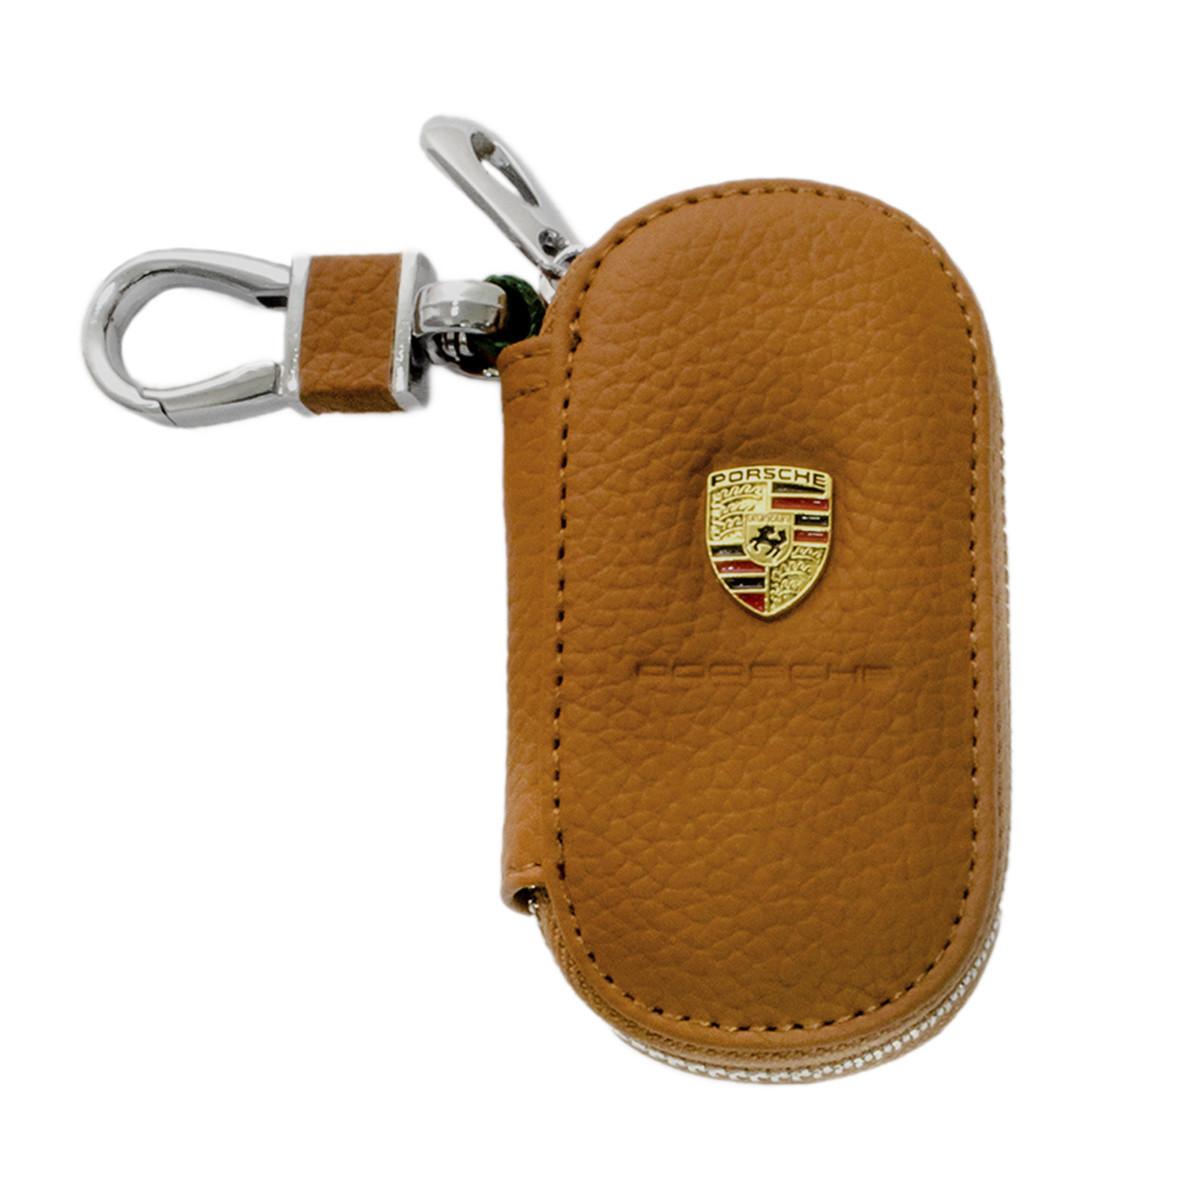 Ключница Carss с логотипом PORSCHE 06001 коричневая